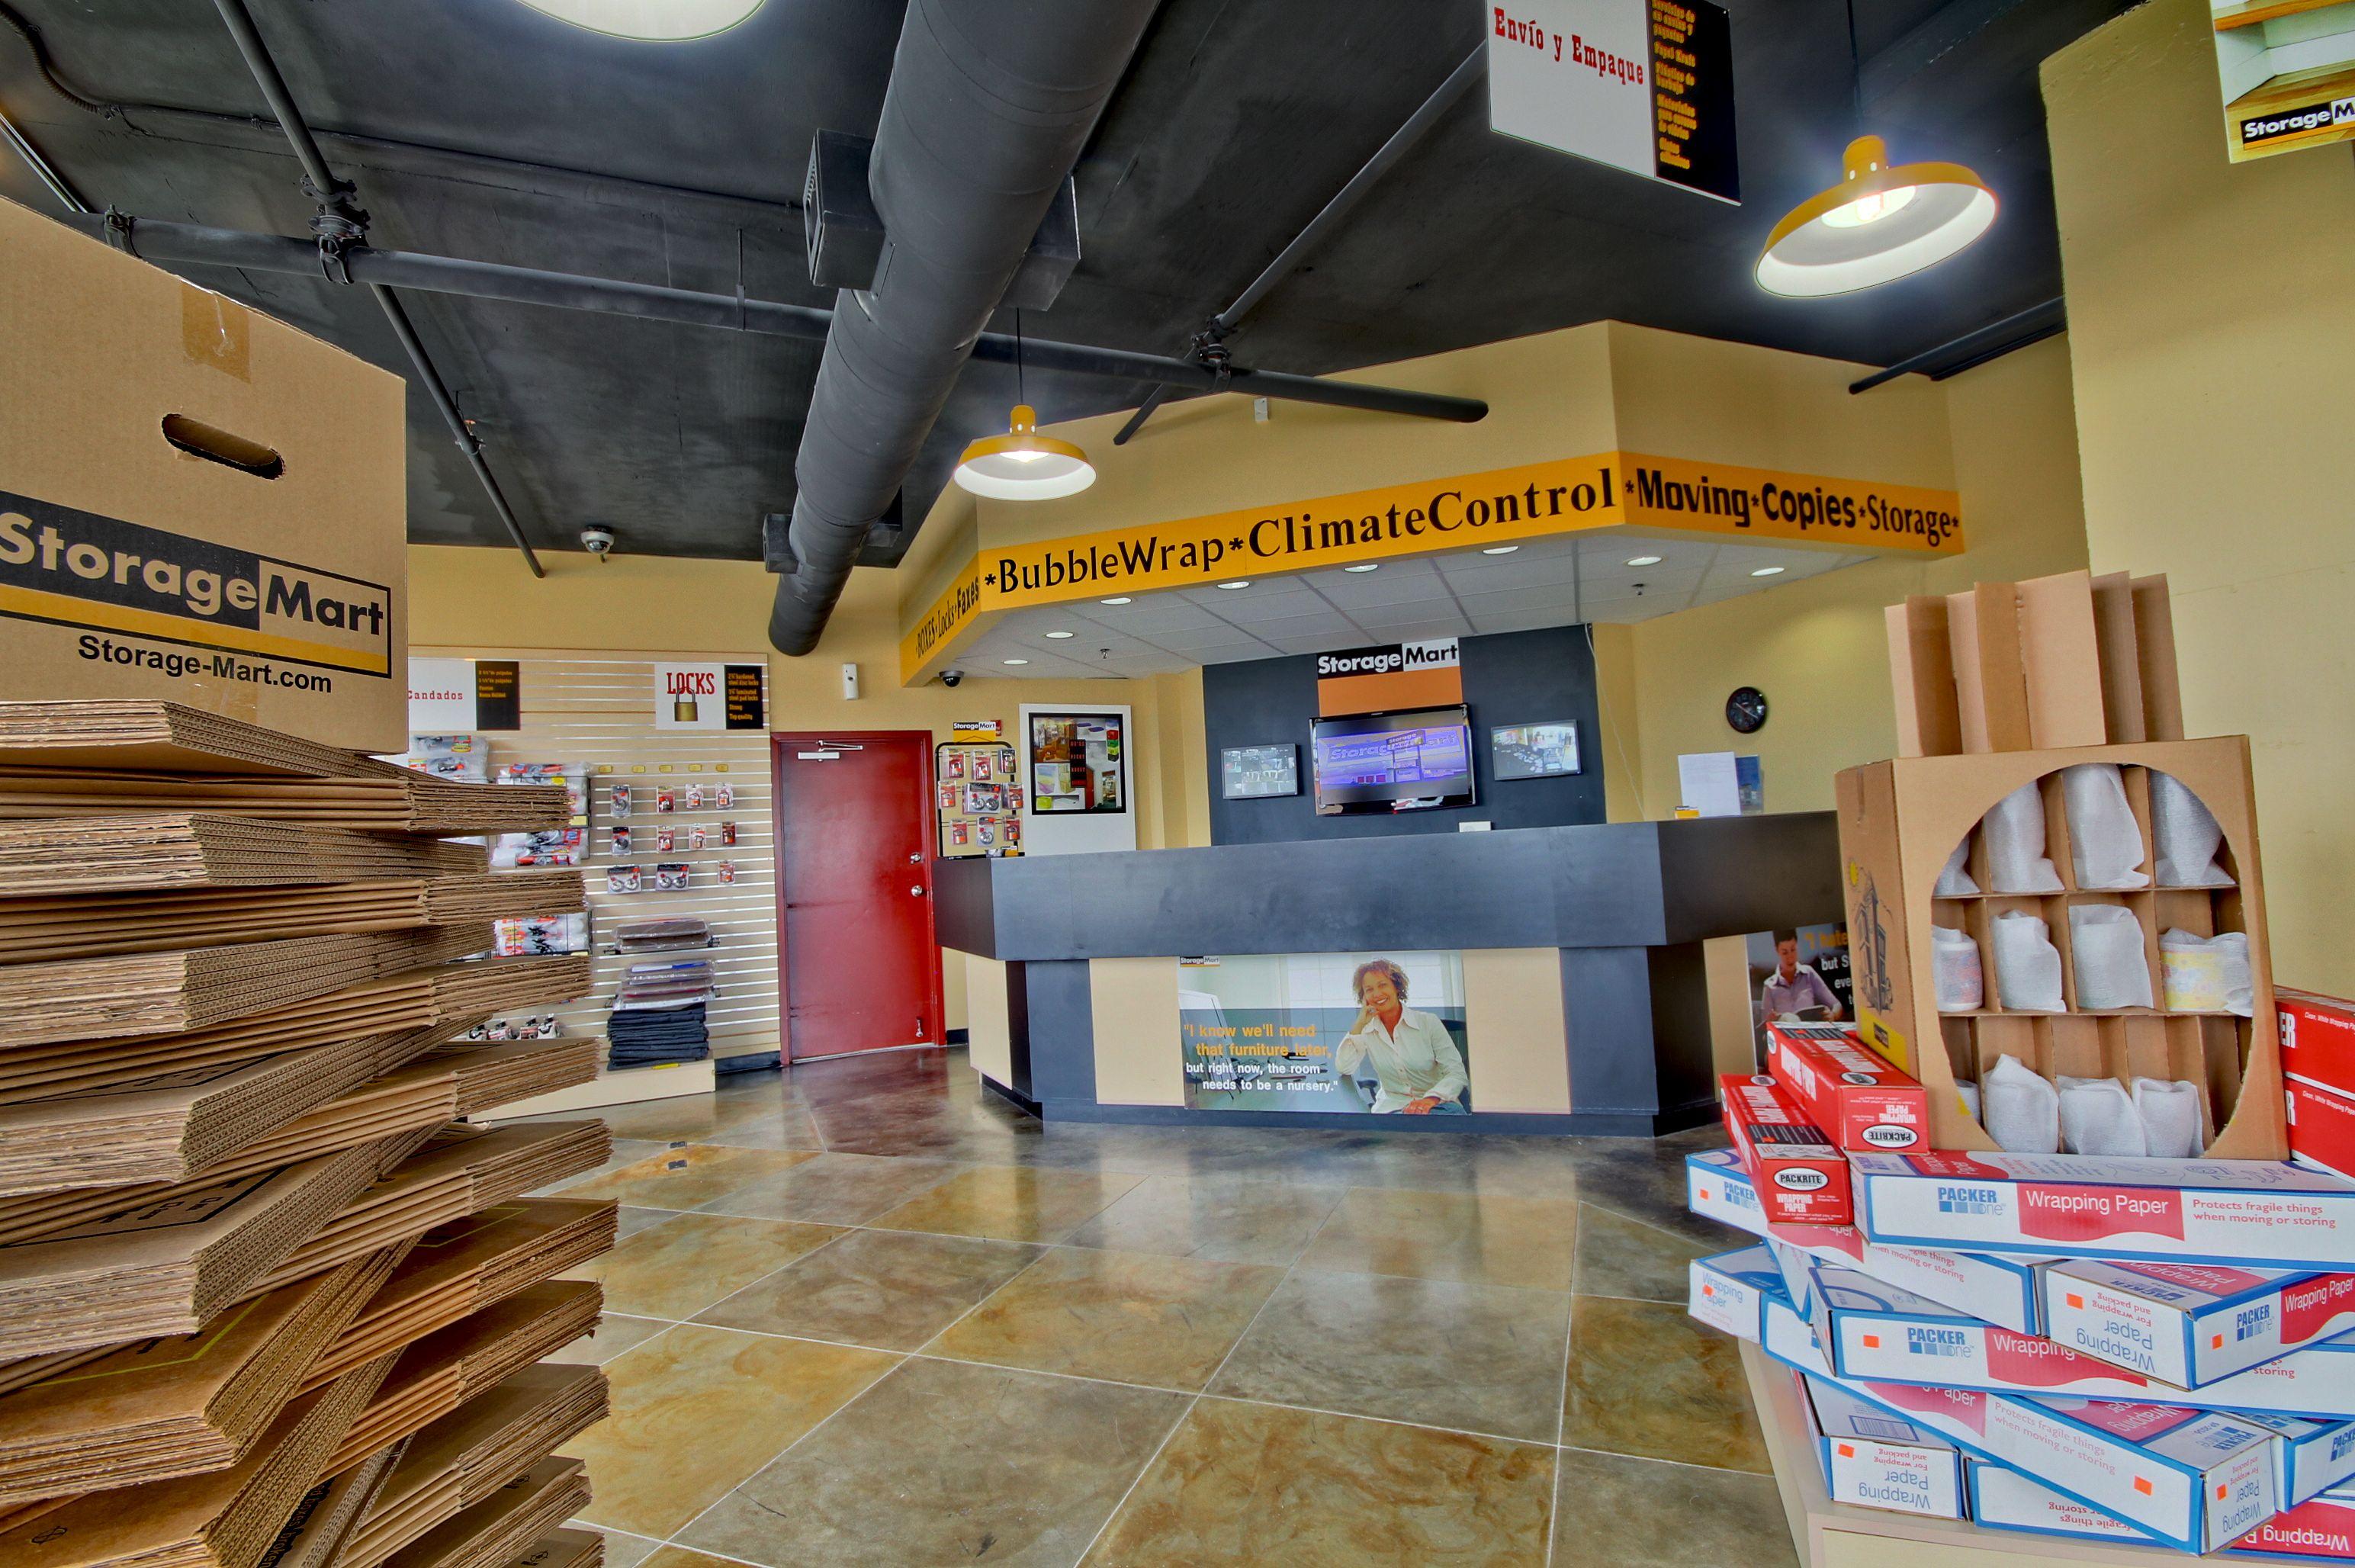 Storagemart In Miami Fl 33165 Chamberofcommerce Com